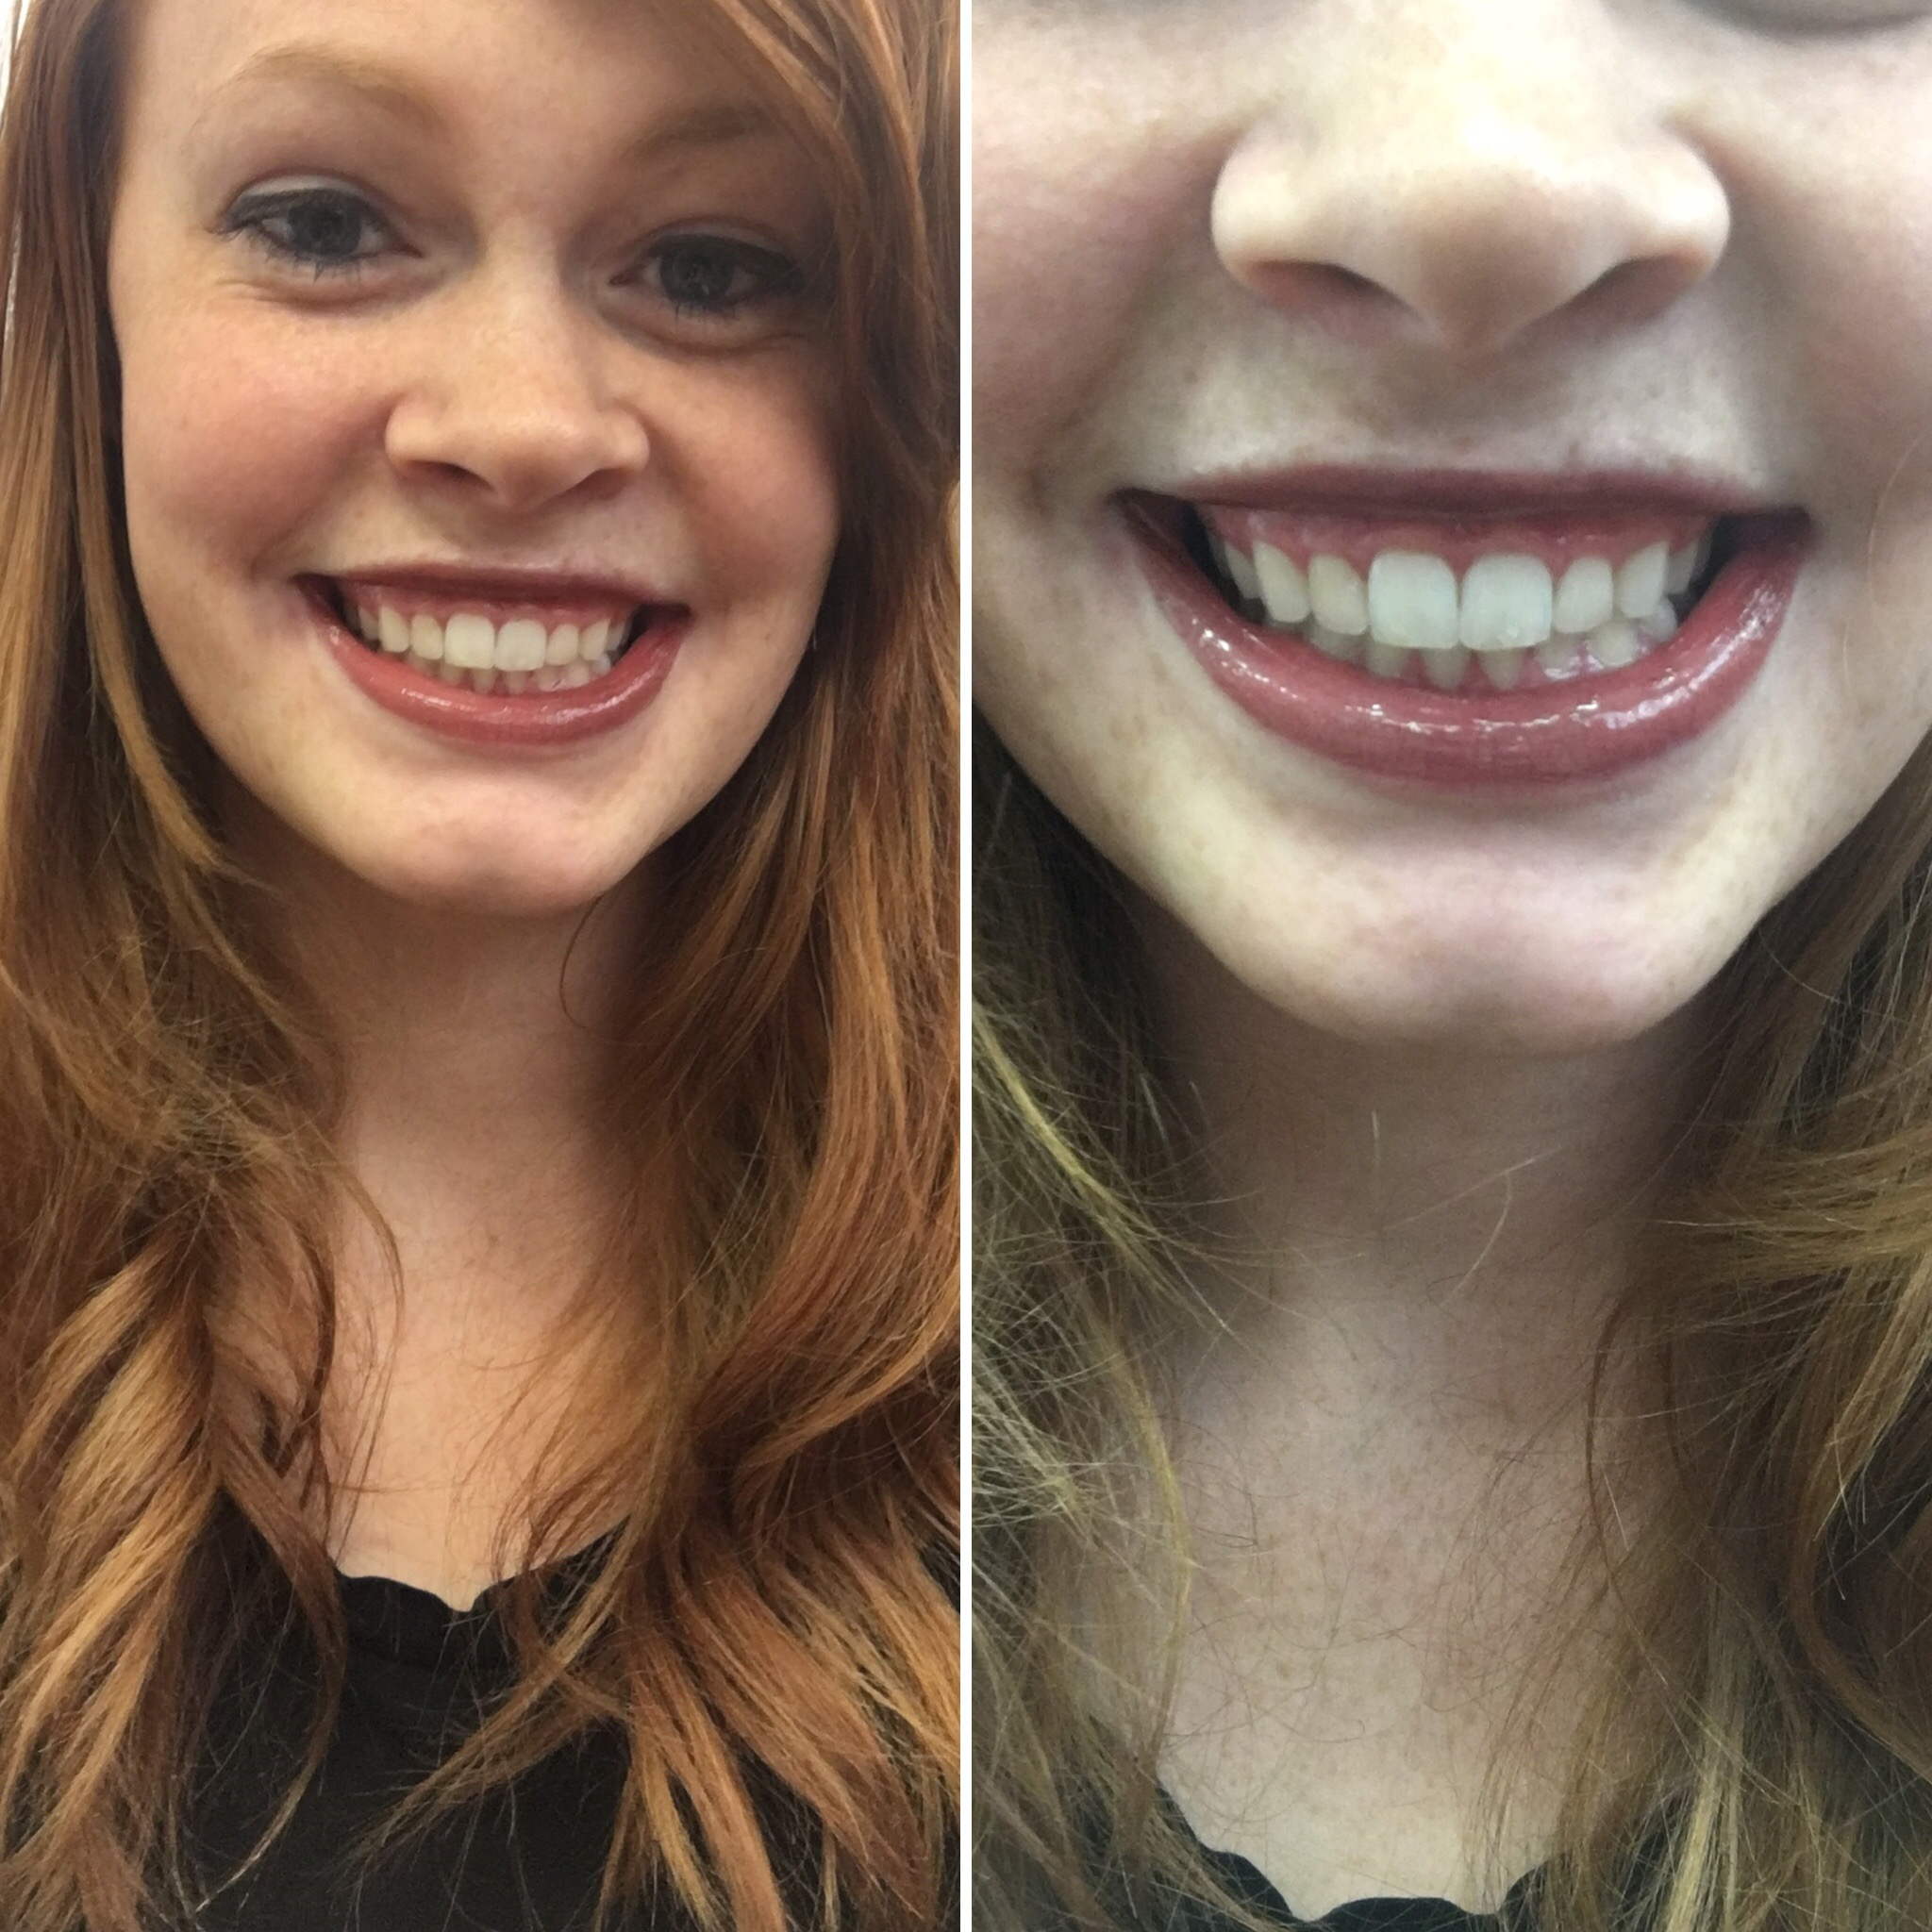 Left Side: before dentist  Right Side: after